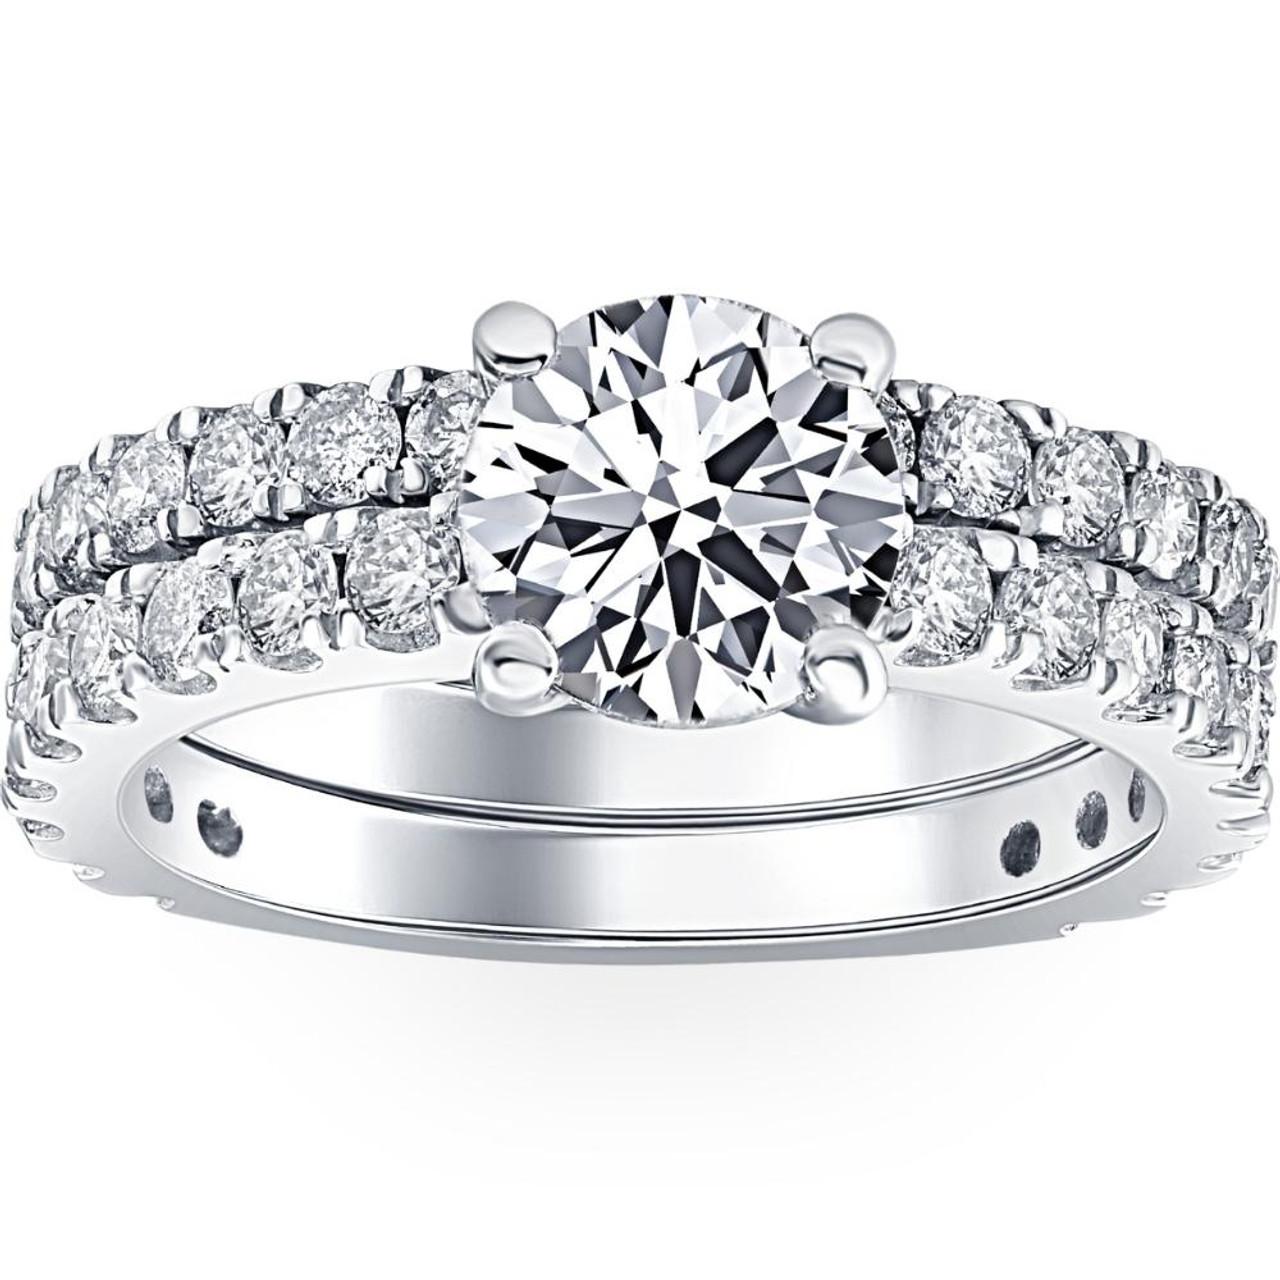 3 1 2 Ct Diamond Engagement Wedding Ring Set 14k White Gold Clarity Enhanced